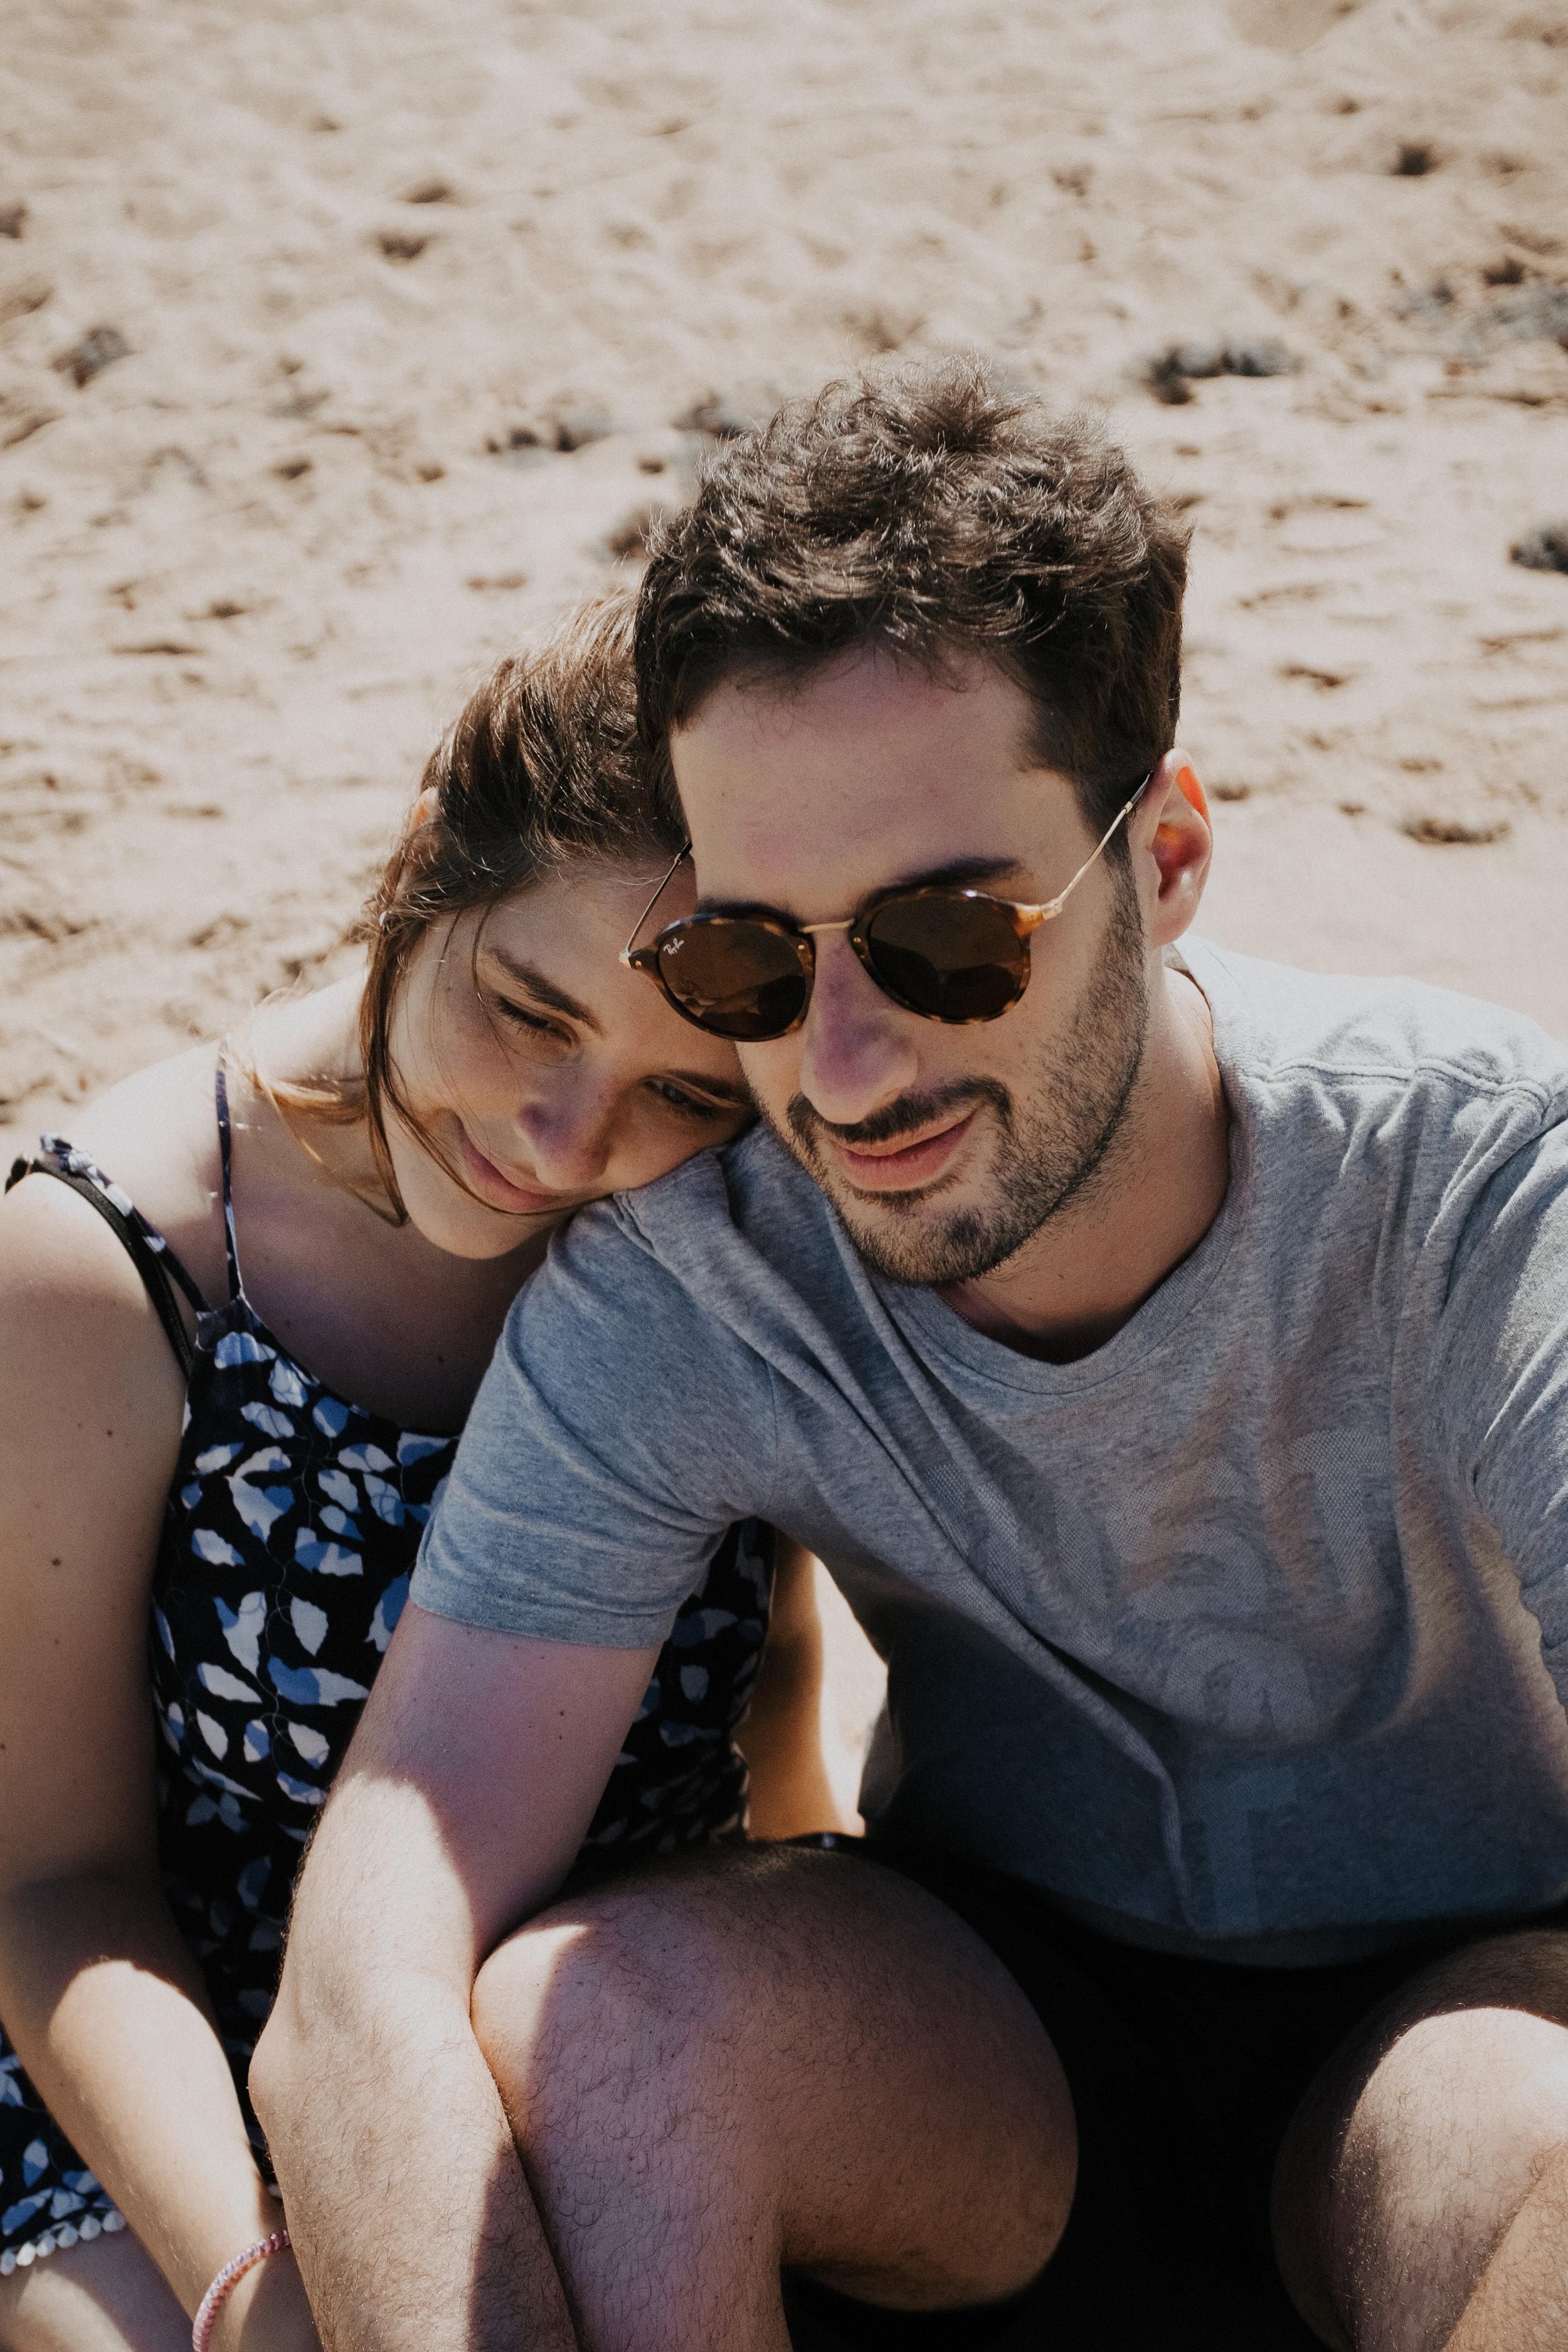 Jony&Nati_PuertoRico_Feb2019_(c)FeliciaLimPhotography_6.jpg